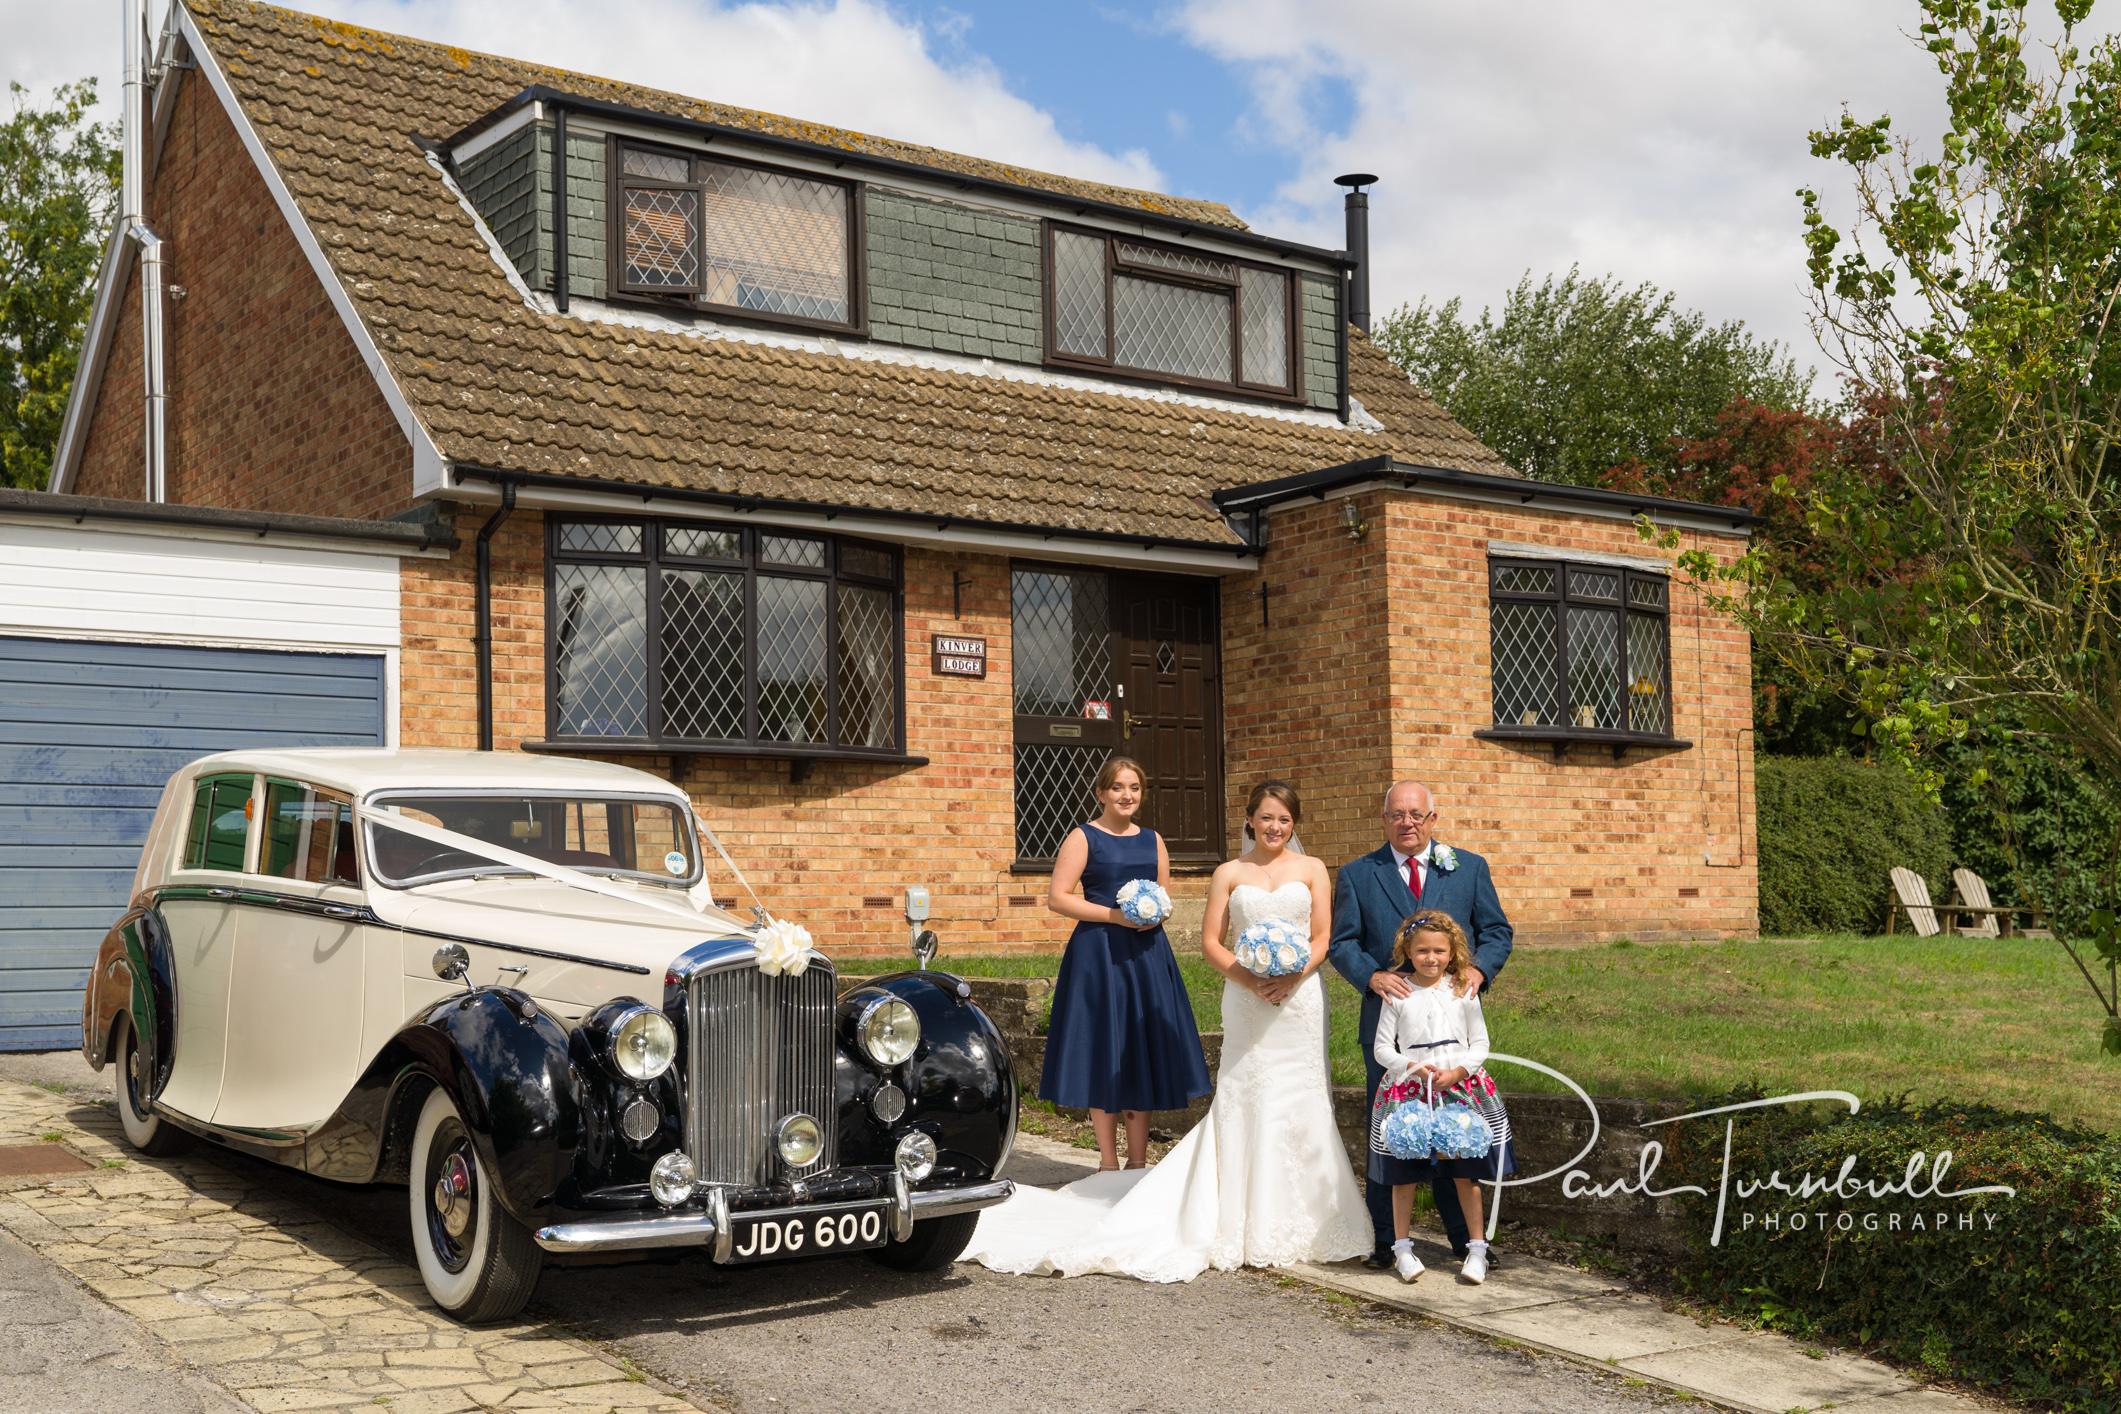 wedding-photographer-south-dalton-walkington-yorkshire-emma-james-022.jpg